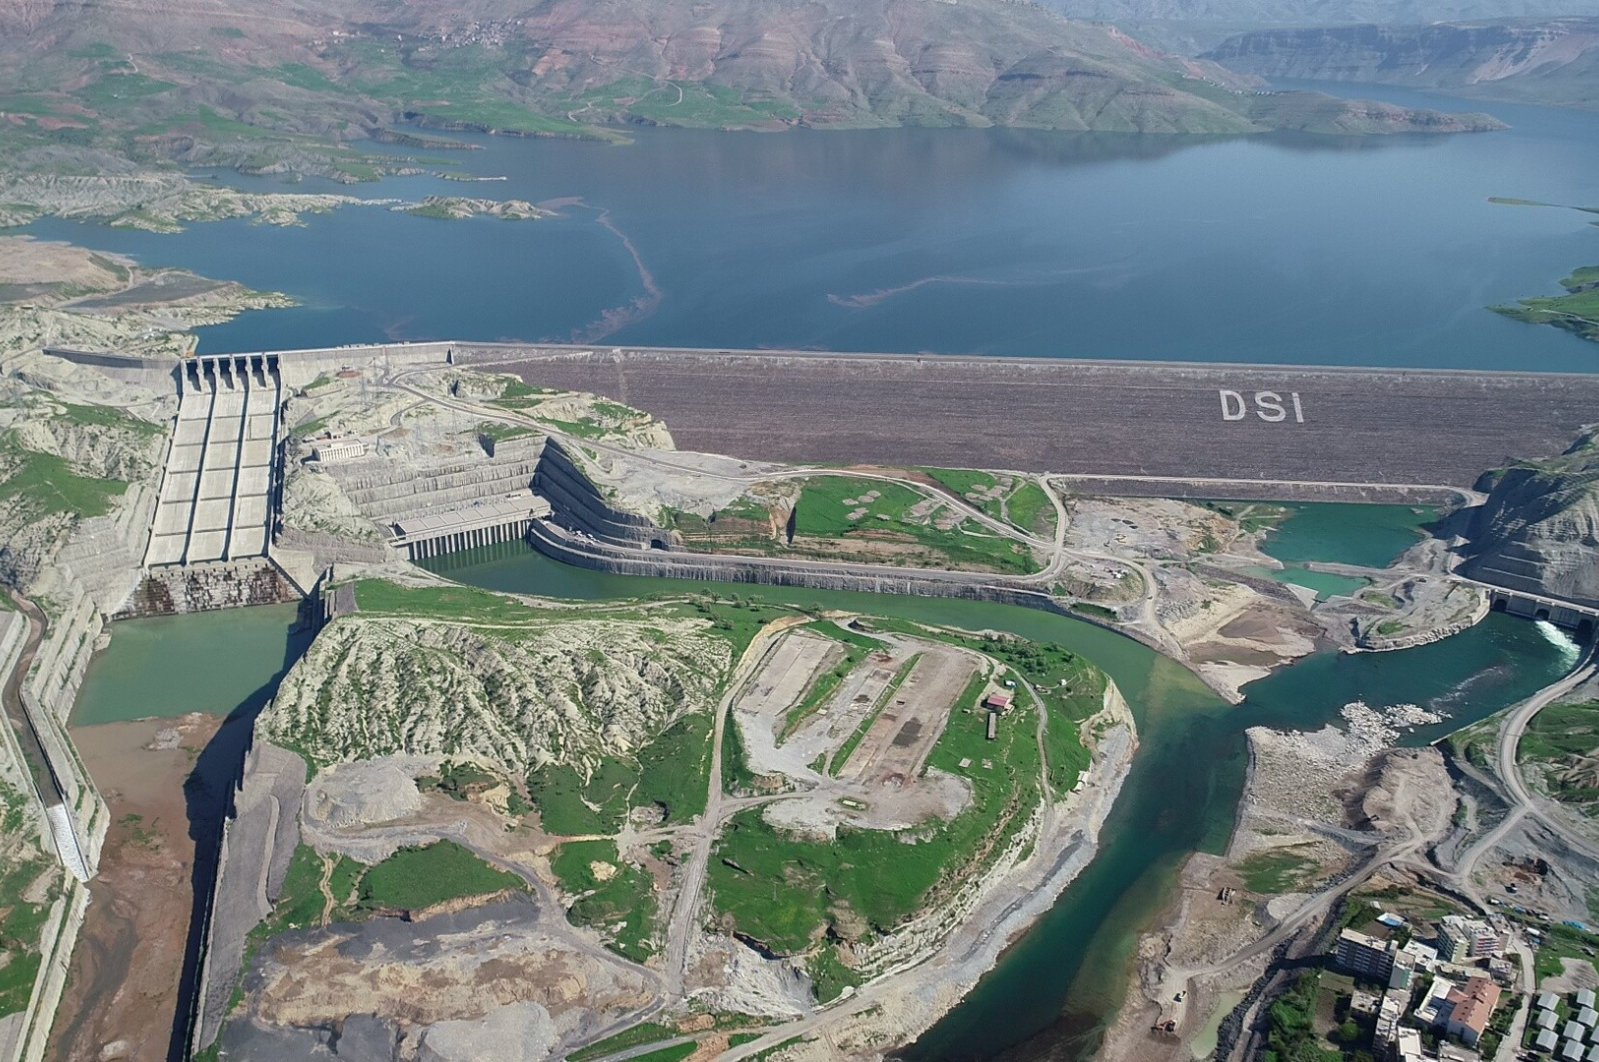 The Ilısu Dam is expected to generate 4.1 billion kilowatt-hour electricity per year. (IHA Photo)